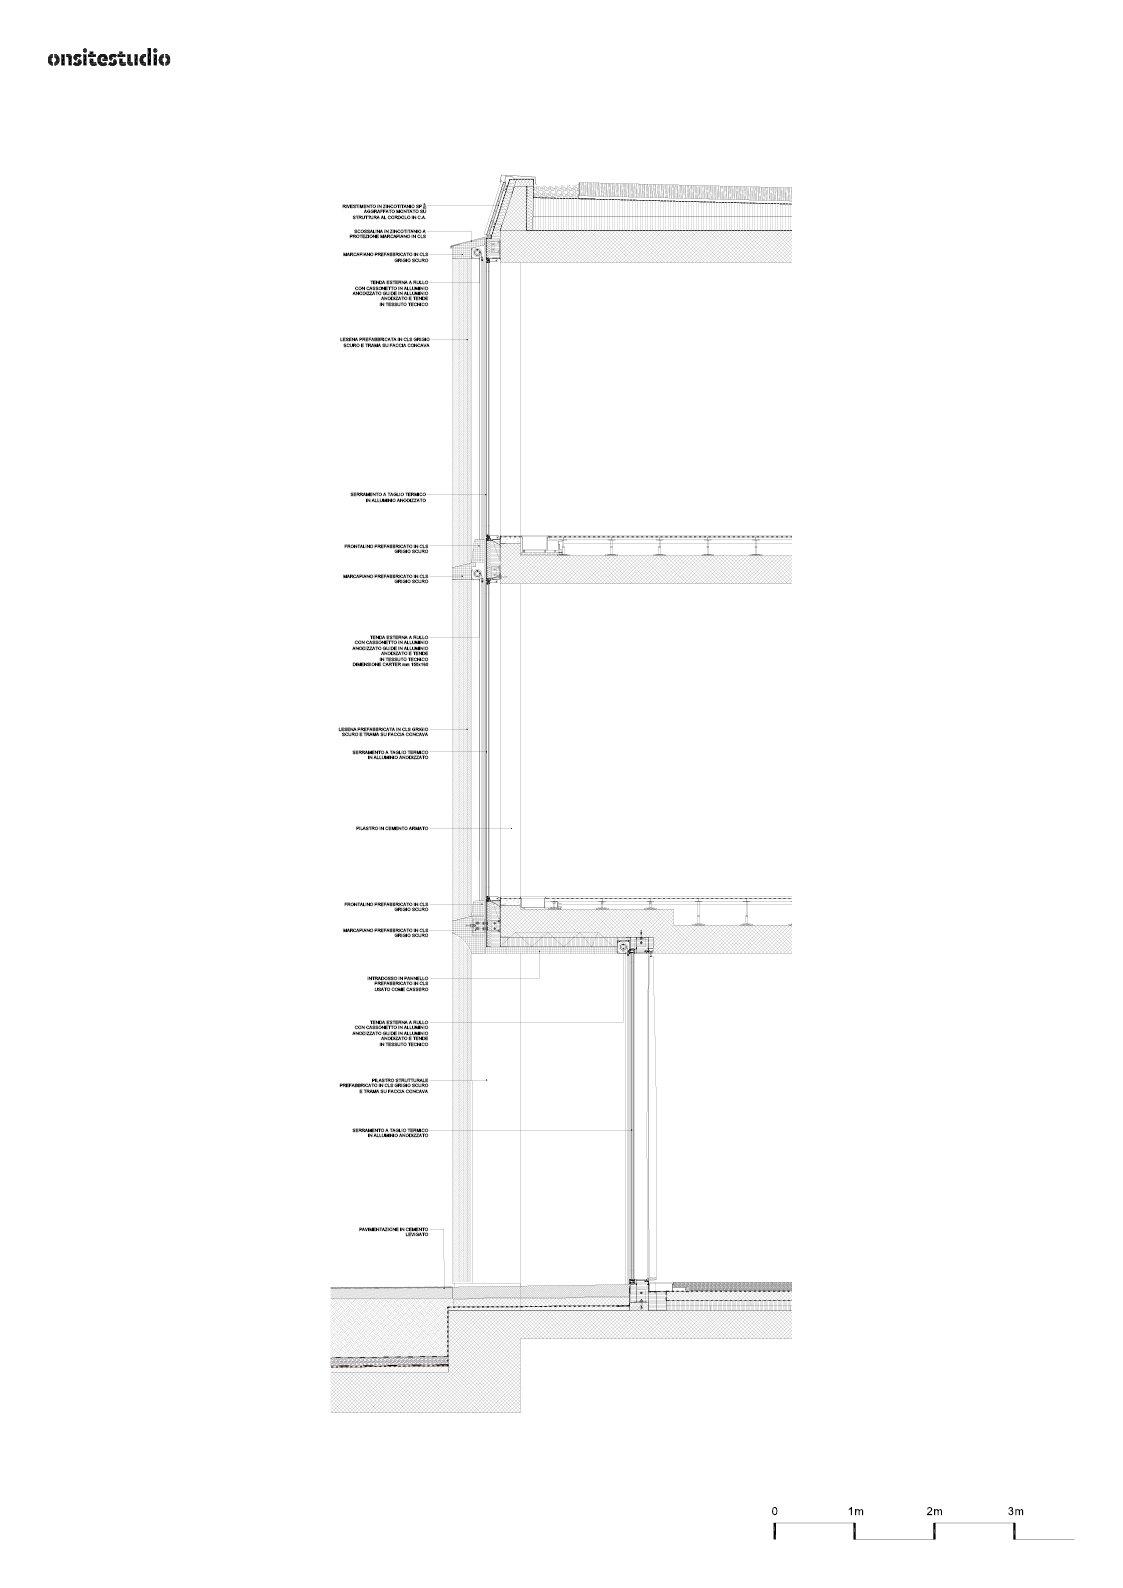 Cross section 2_Details section_1-50 onsitestudio}